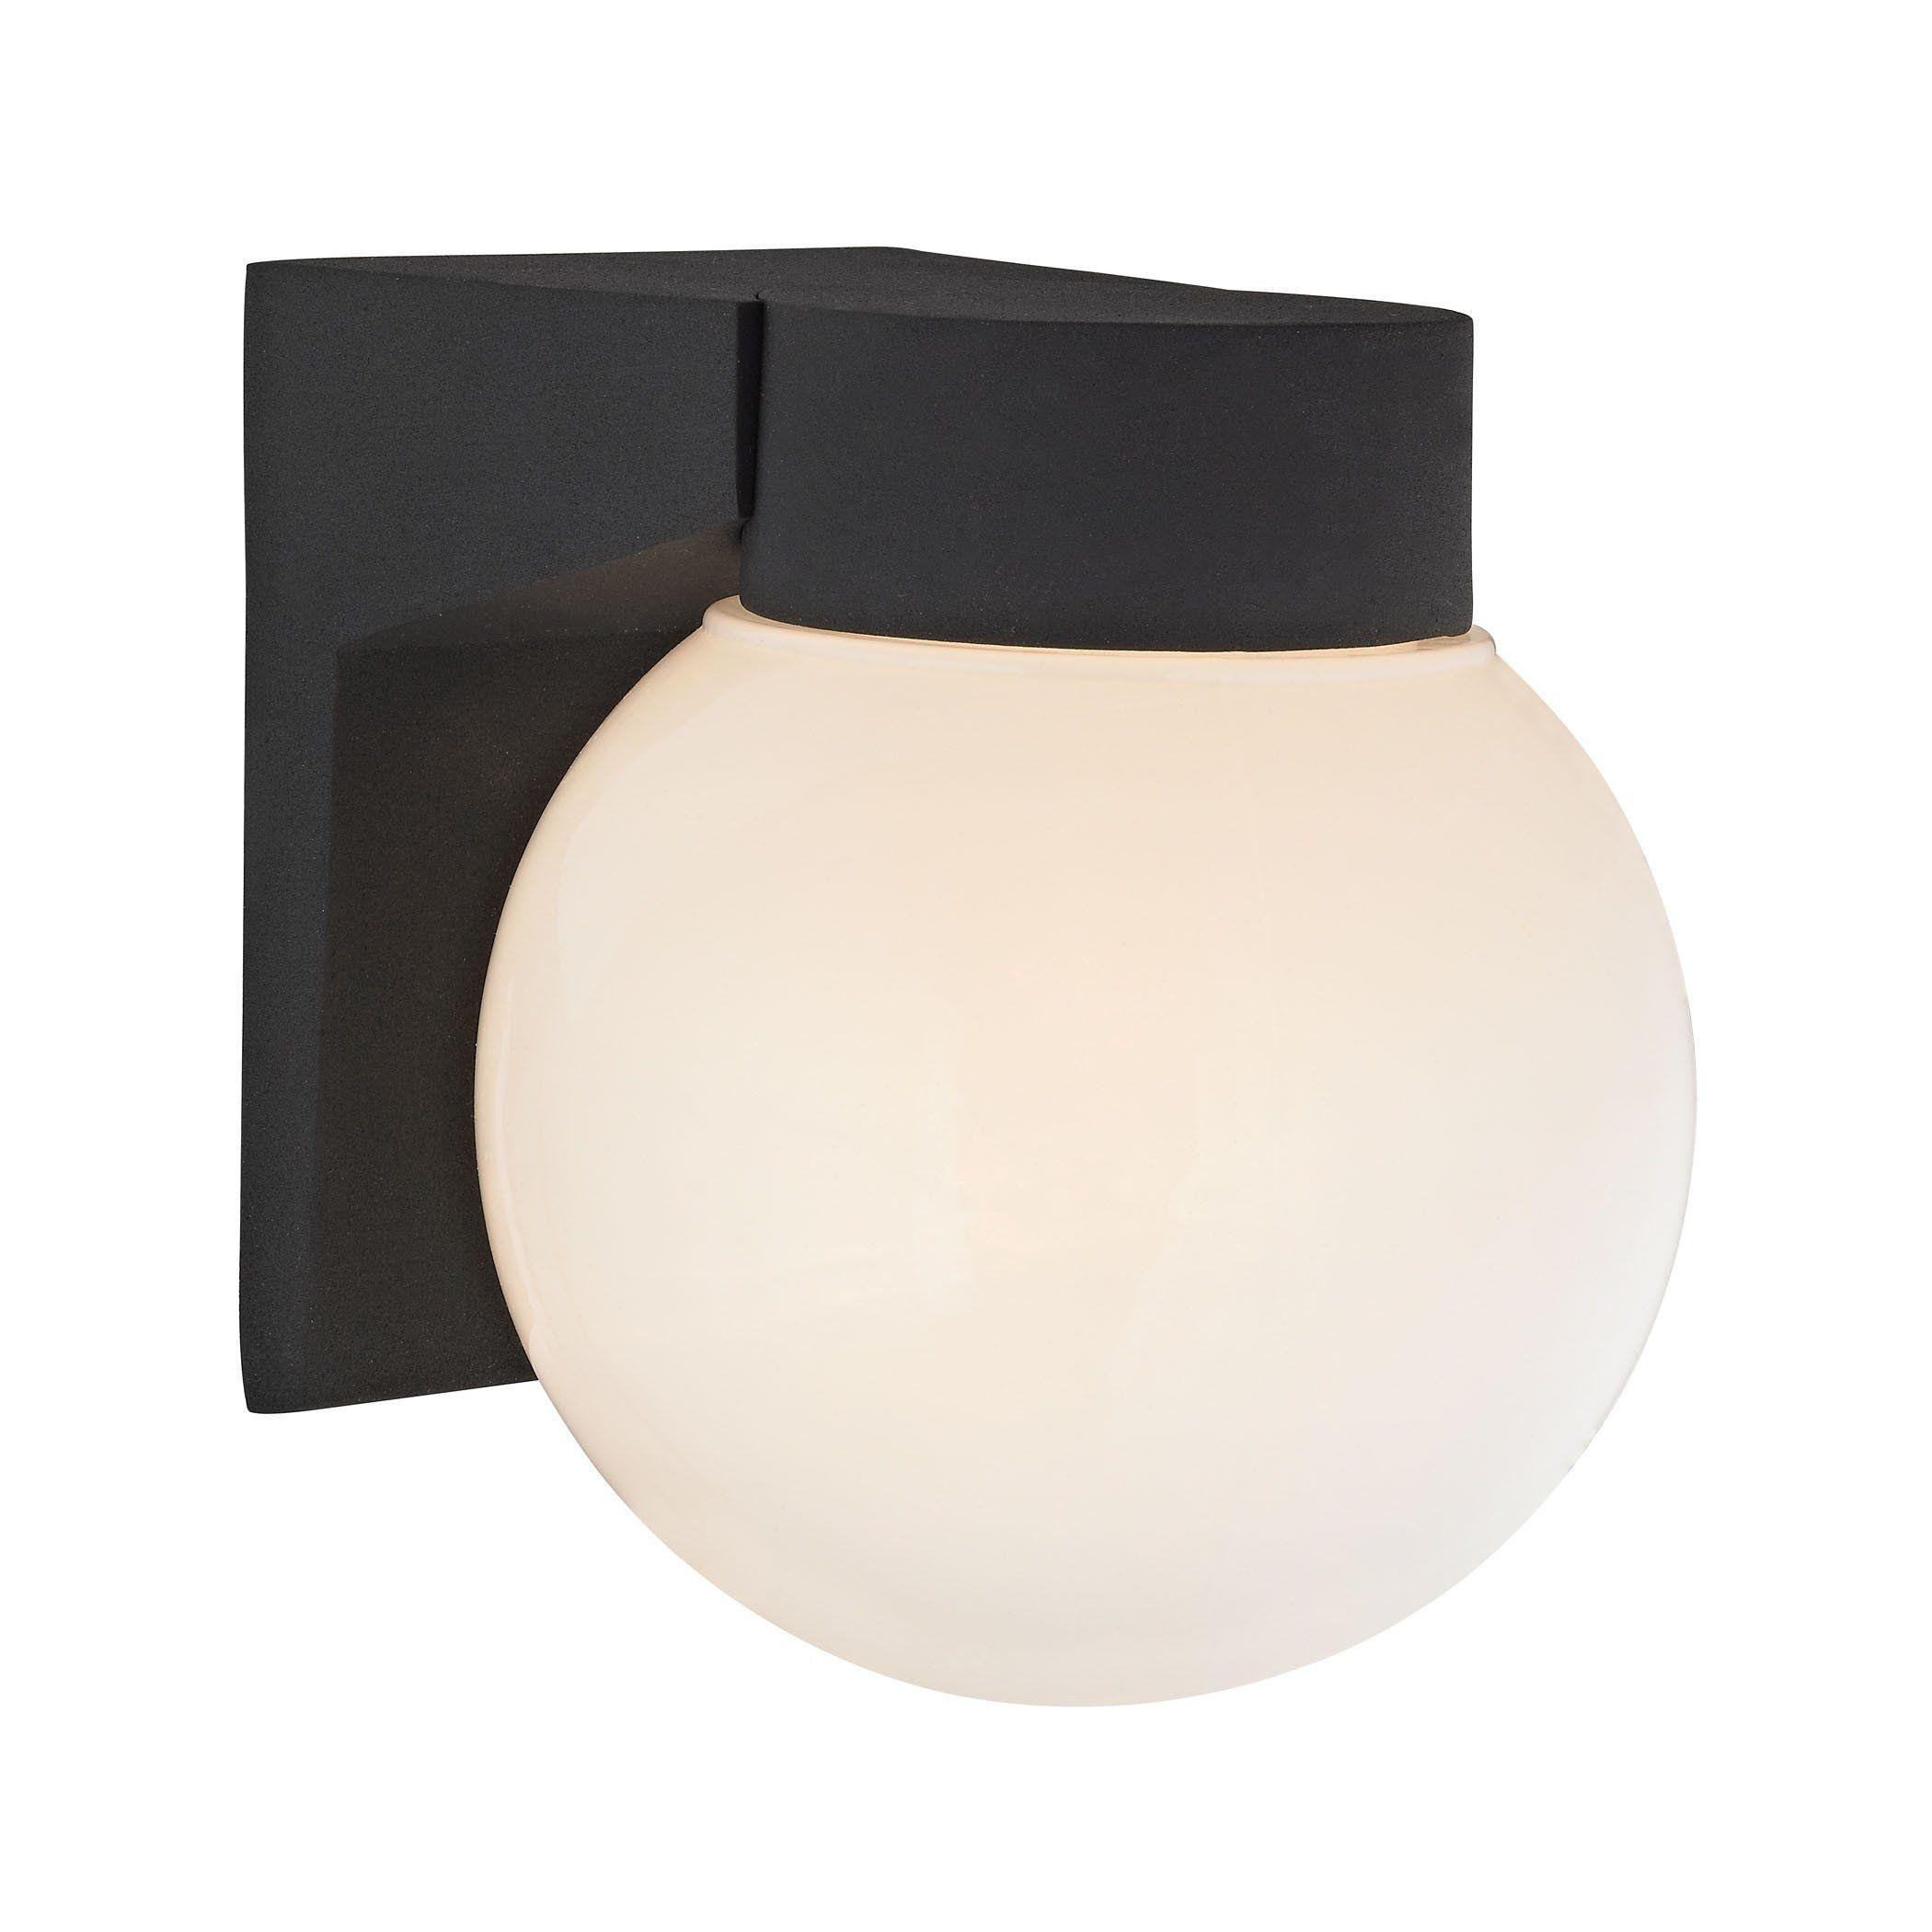 light outdoor wall sconce in matt black products pinterest